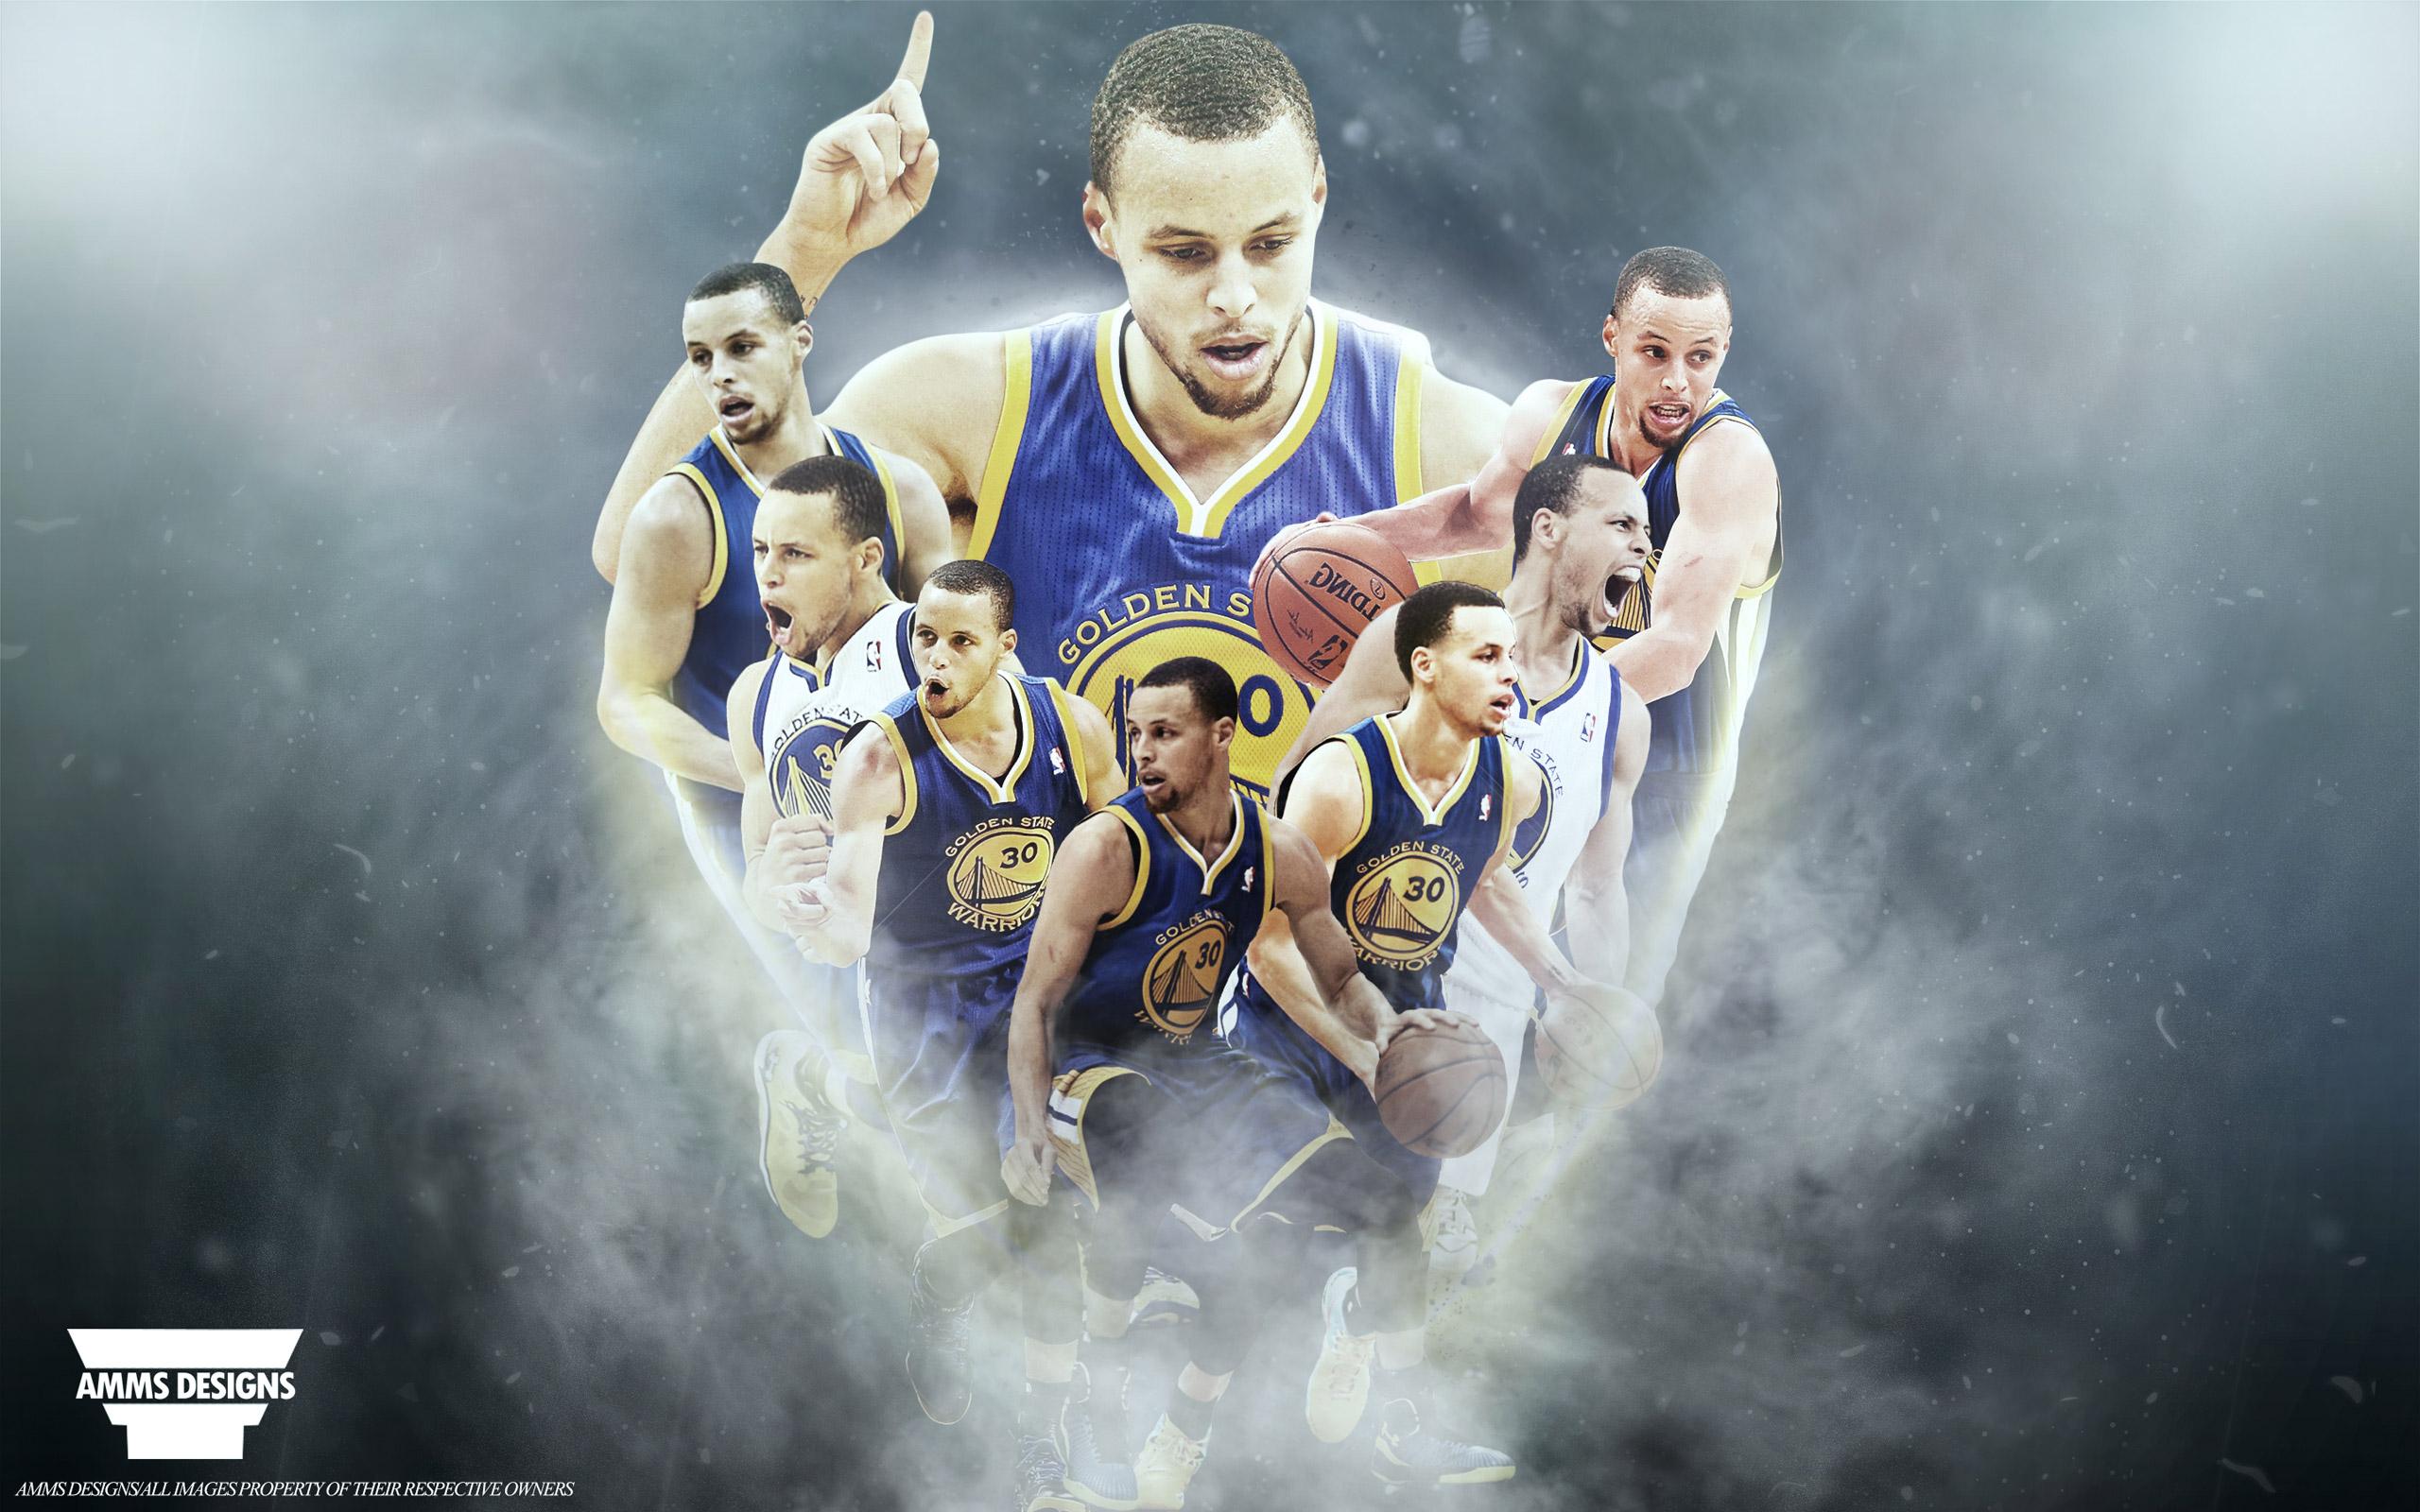 Stephen Curry 2014 2015 NBA MVP Wallpaper   Basketball Wallpapers 2560x1600